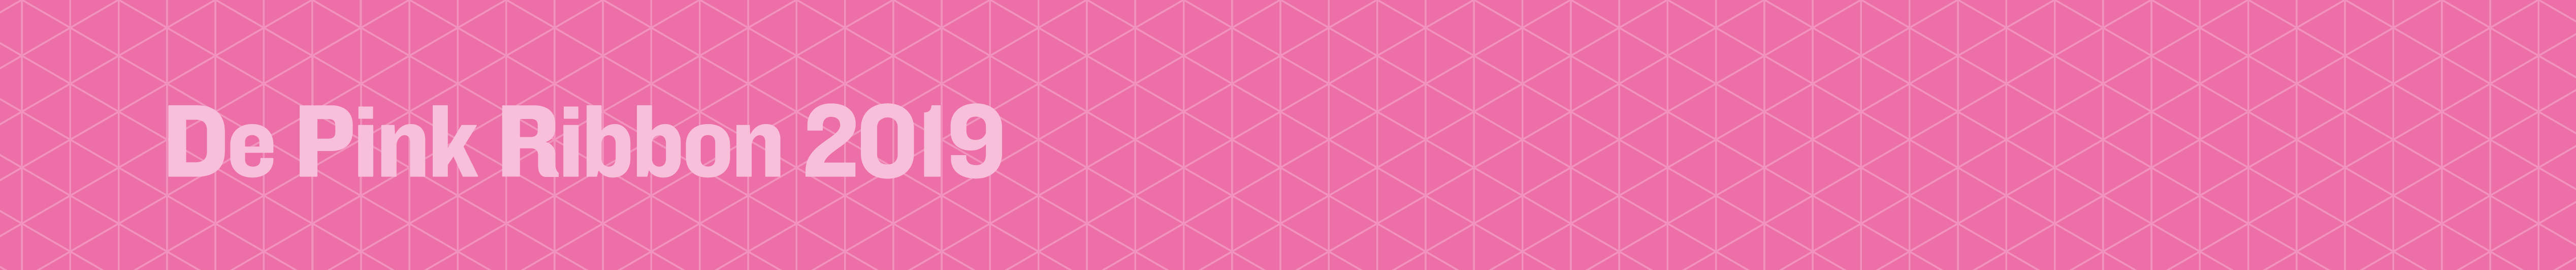 20190920 Banner Pink Ribbon